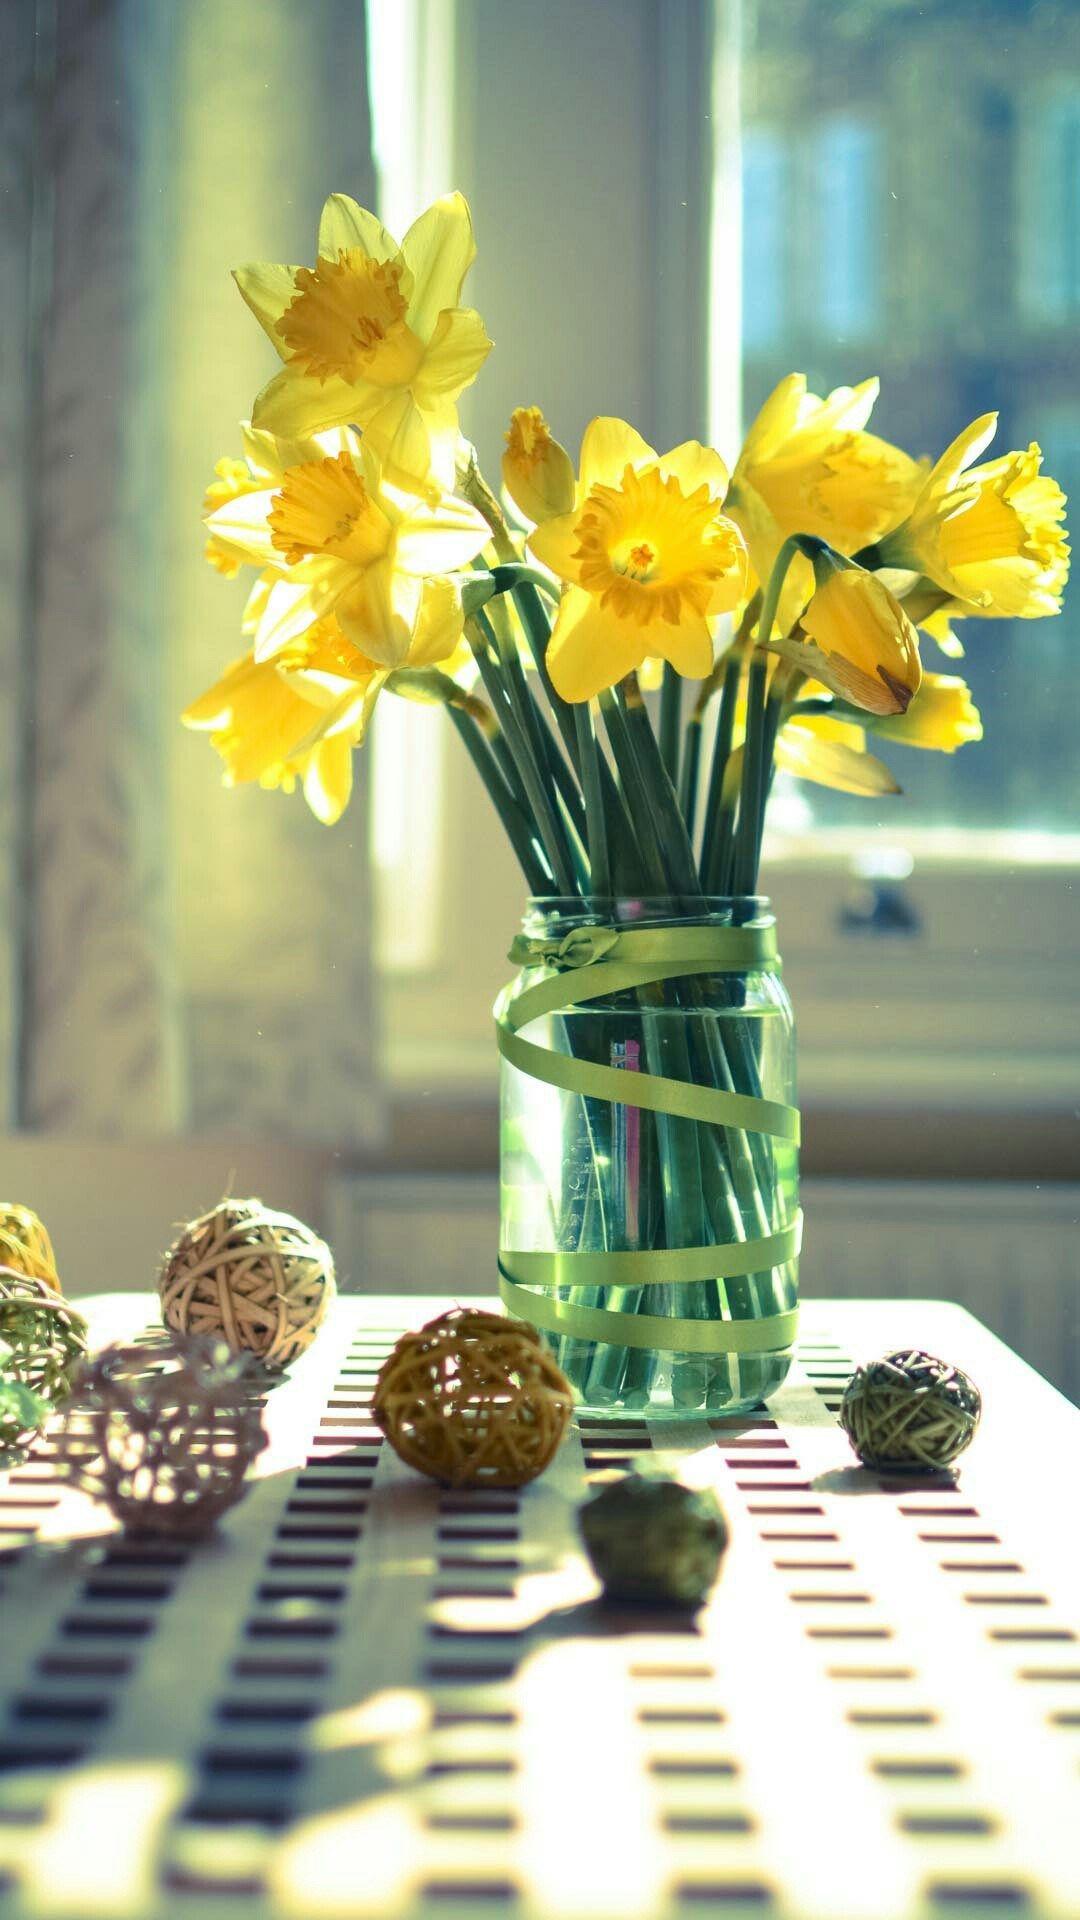 Morning Warm Sunshine Bright Desk Flowers Vase Iphone 6 Wallpaper Desk Flowers Flower Vases Vase Fantastic flower vase wallpaper images